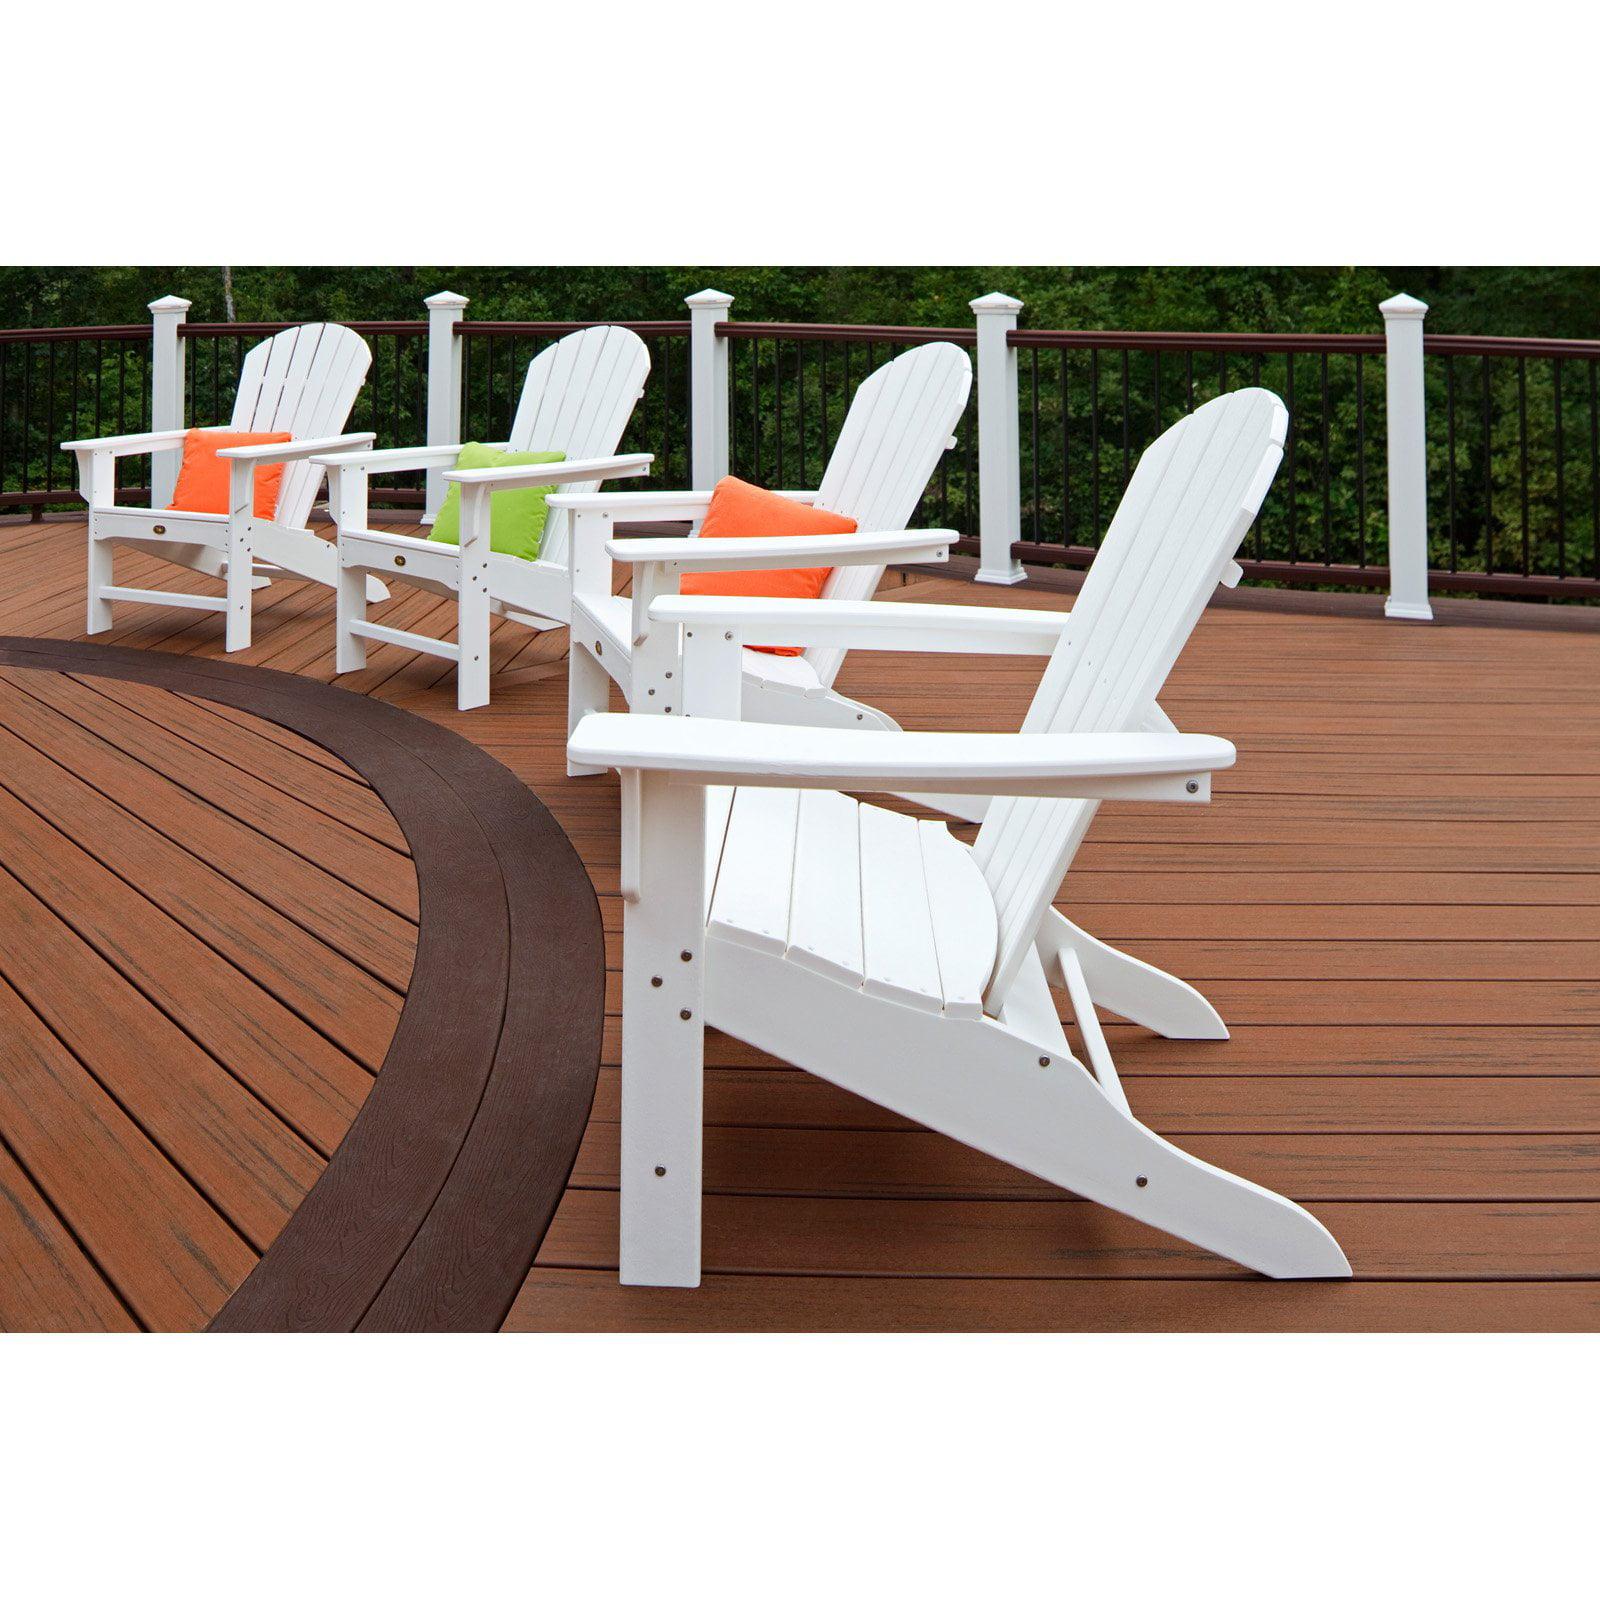 Trex Outdoor Furniture Recycled Plastic Cape Cod Adirondack Chair    Walmart.com